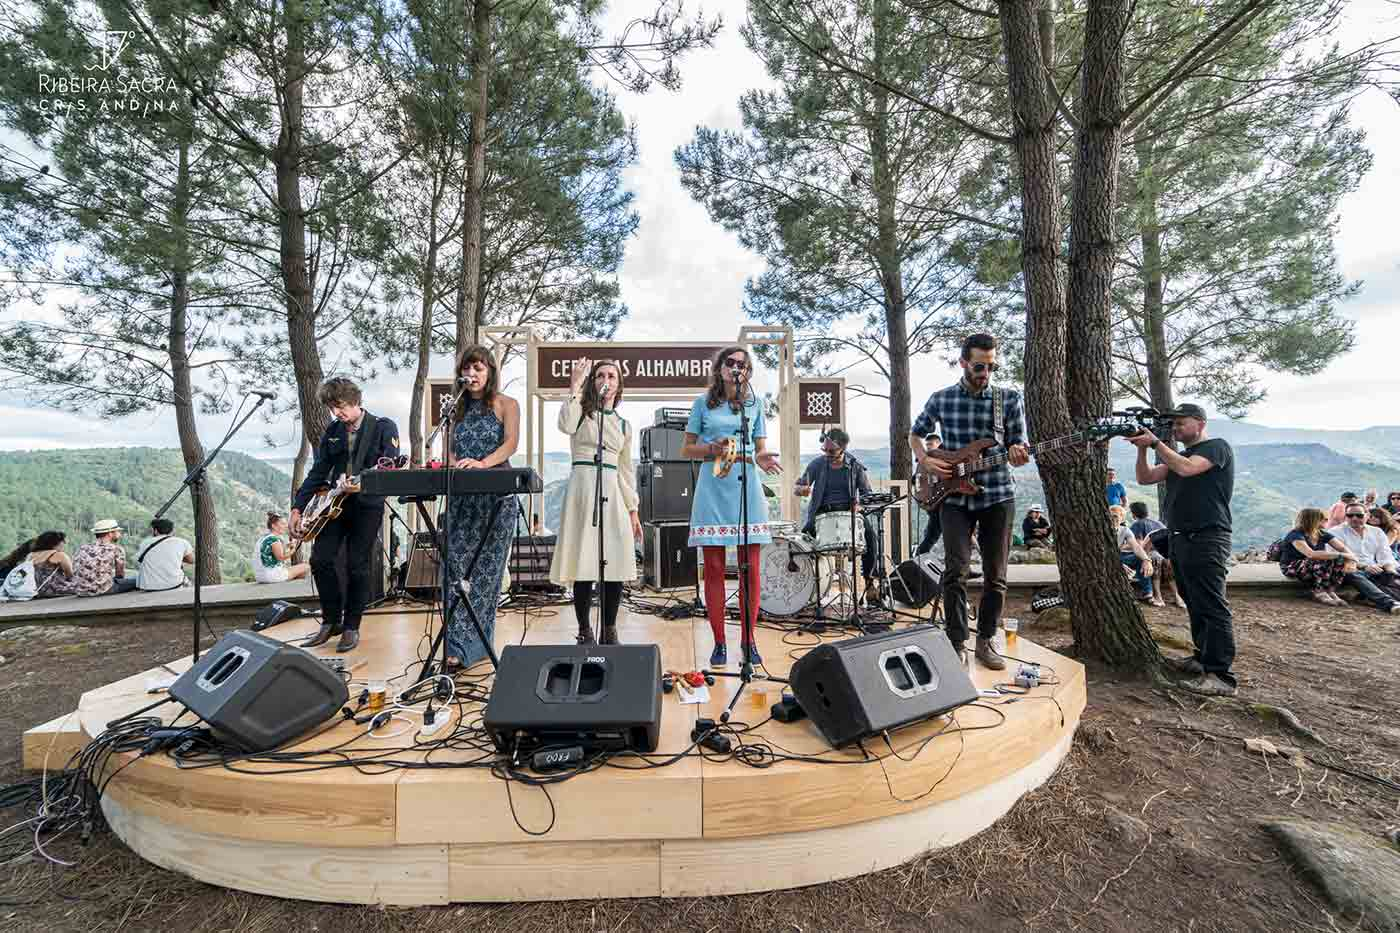 Música, vino y gastronomía se unen en el Festival Ribeira Sacra